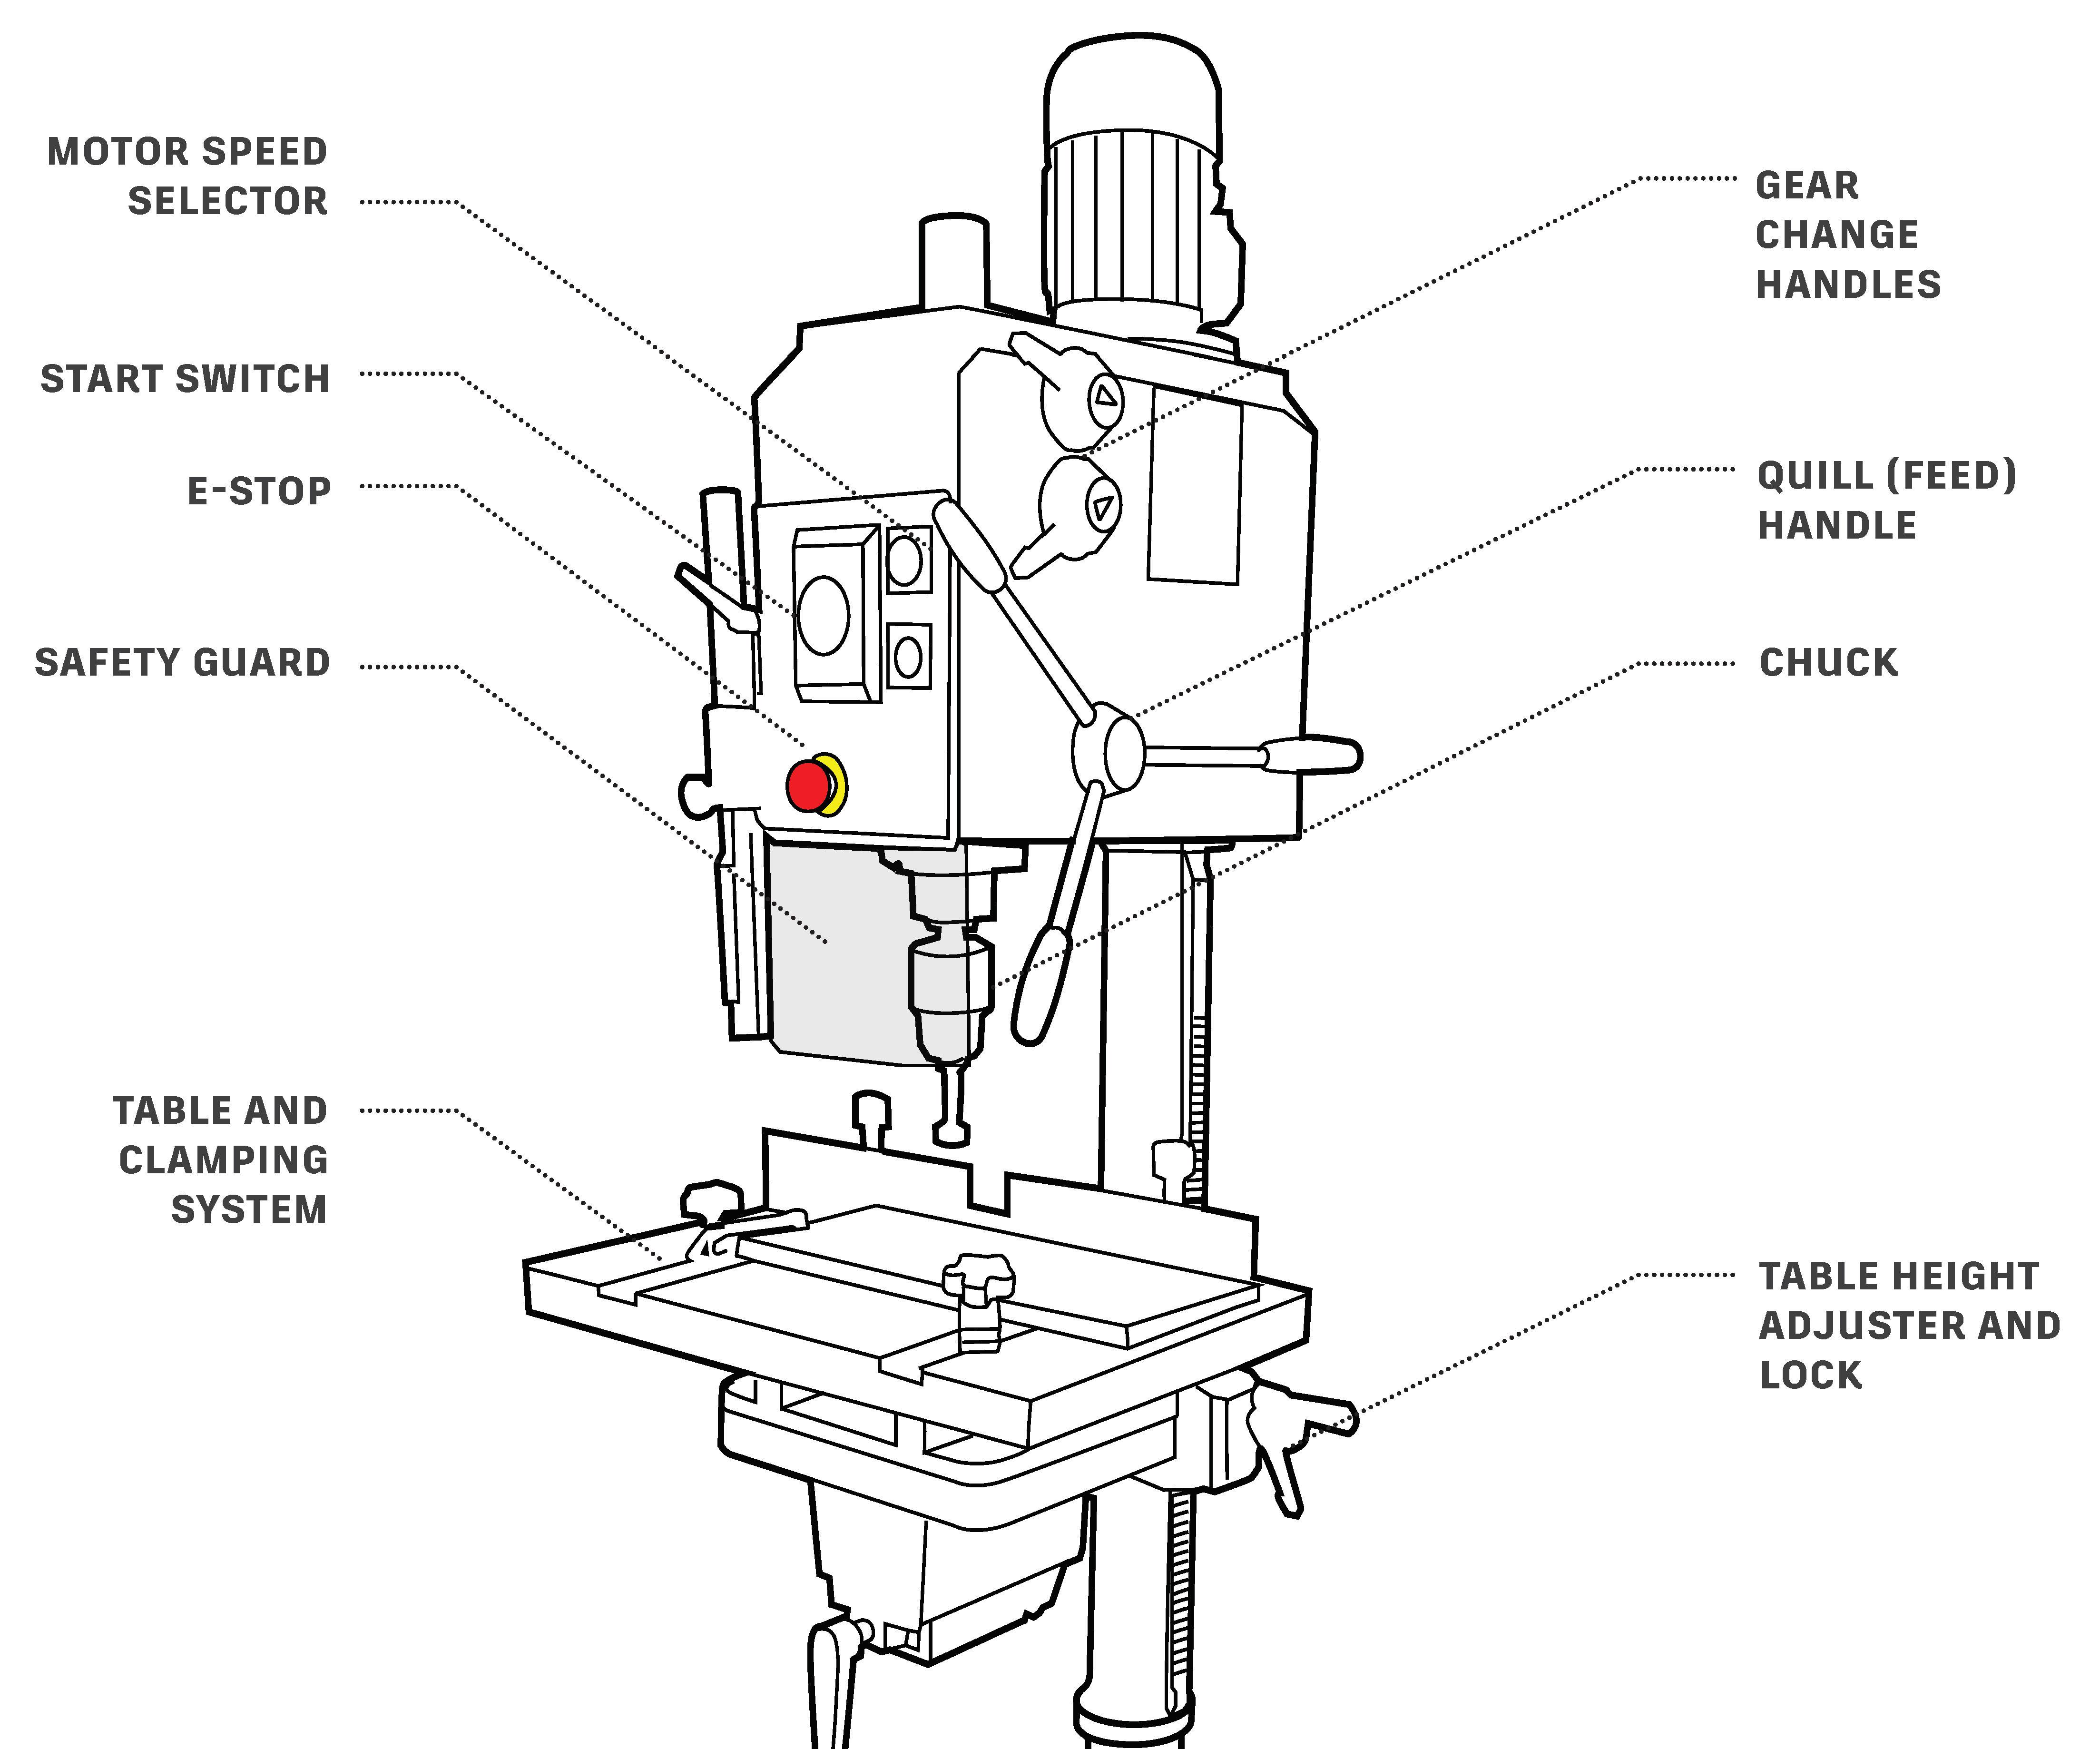 drill press wiring diagram wiring diagram yer drill press wiring diagram [ 4414 x 3676 Pixel ]